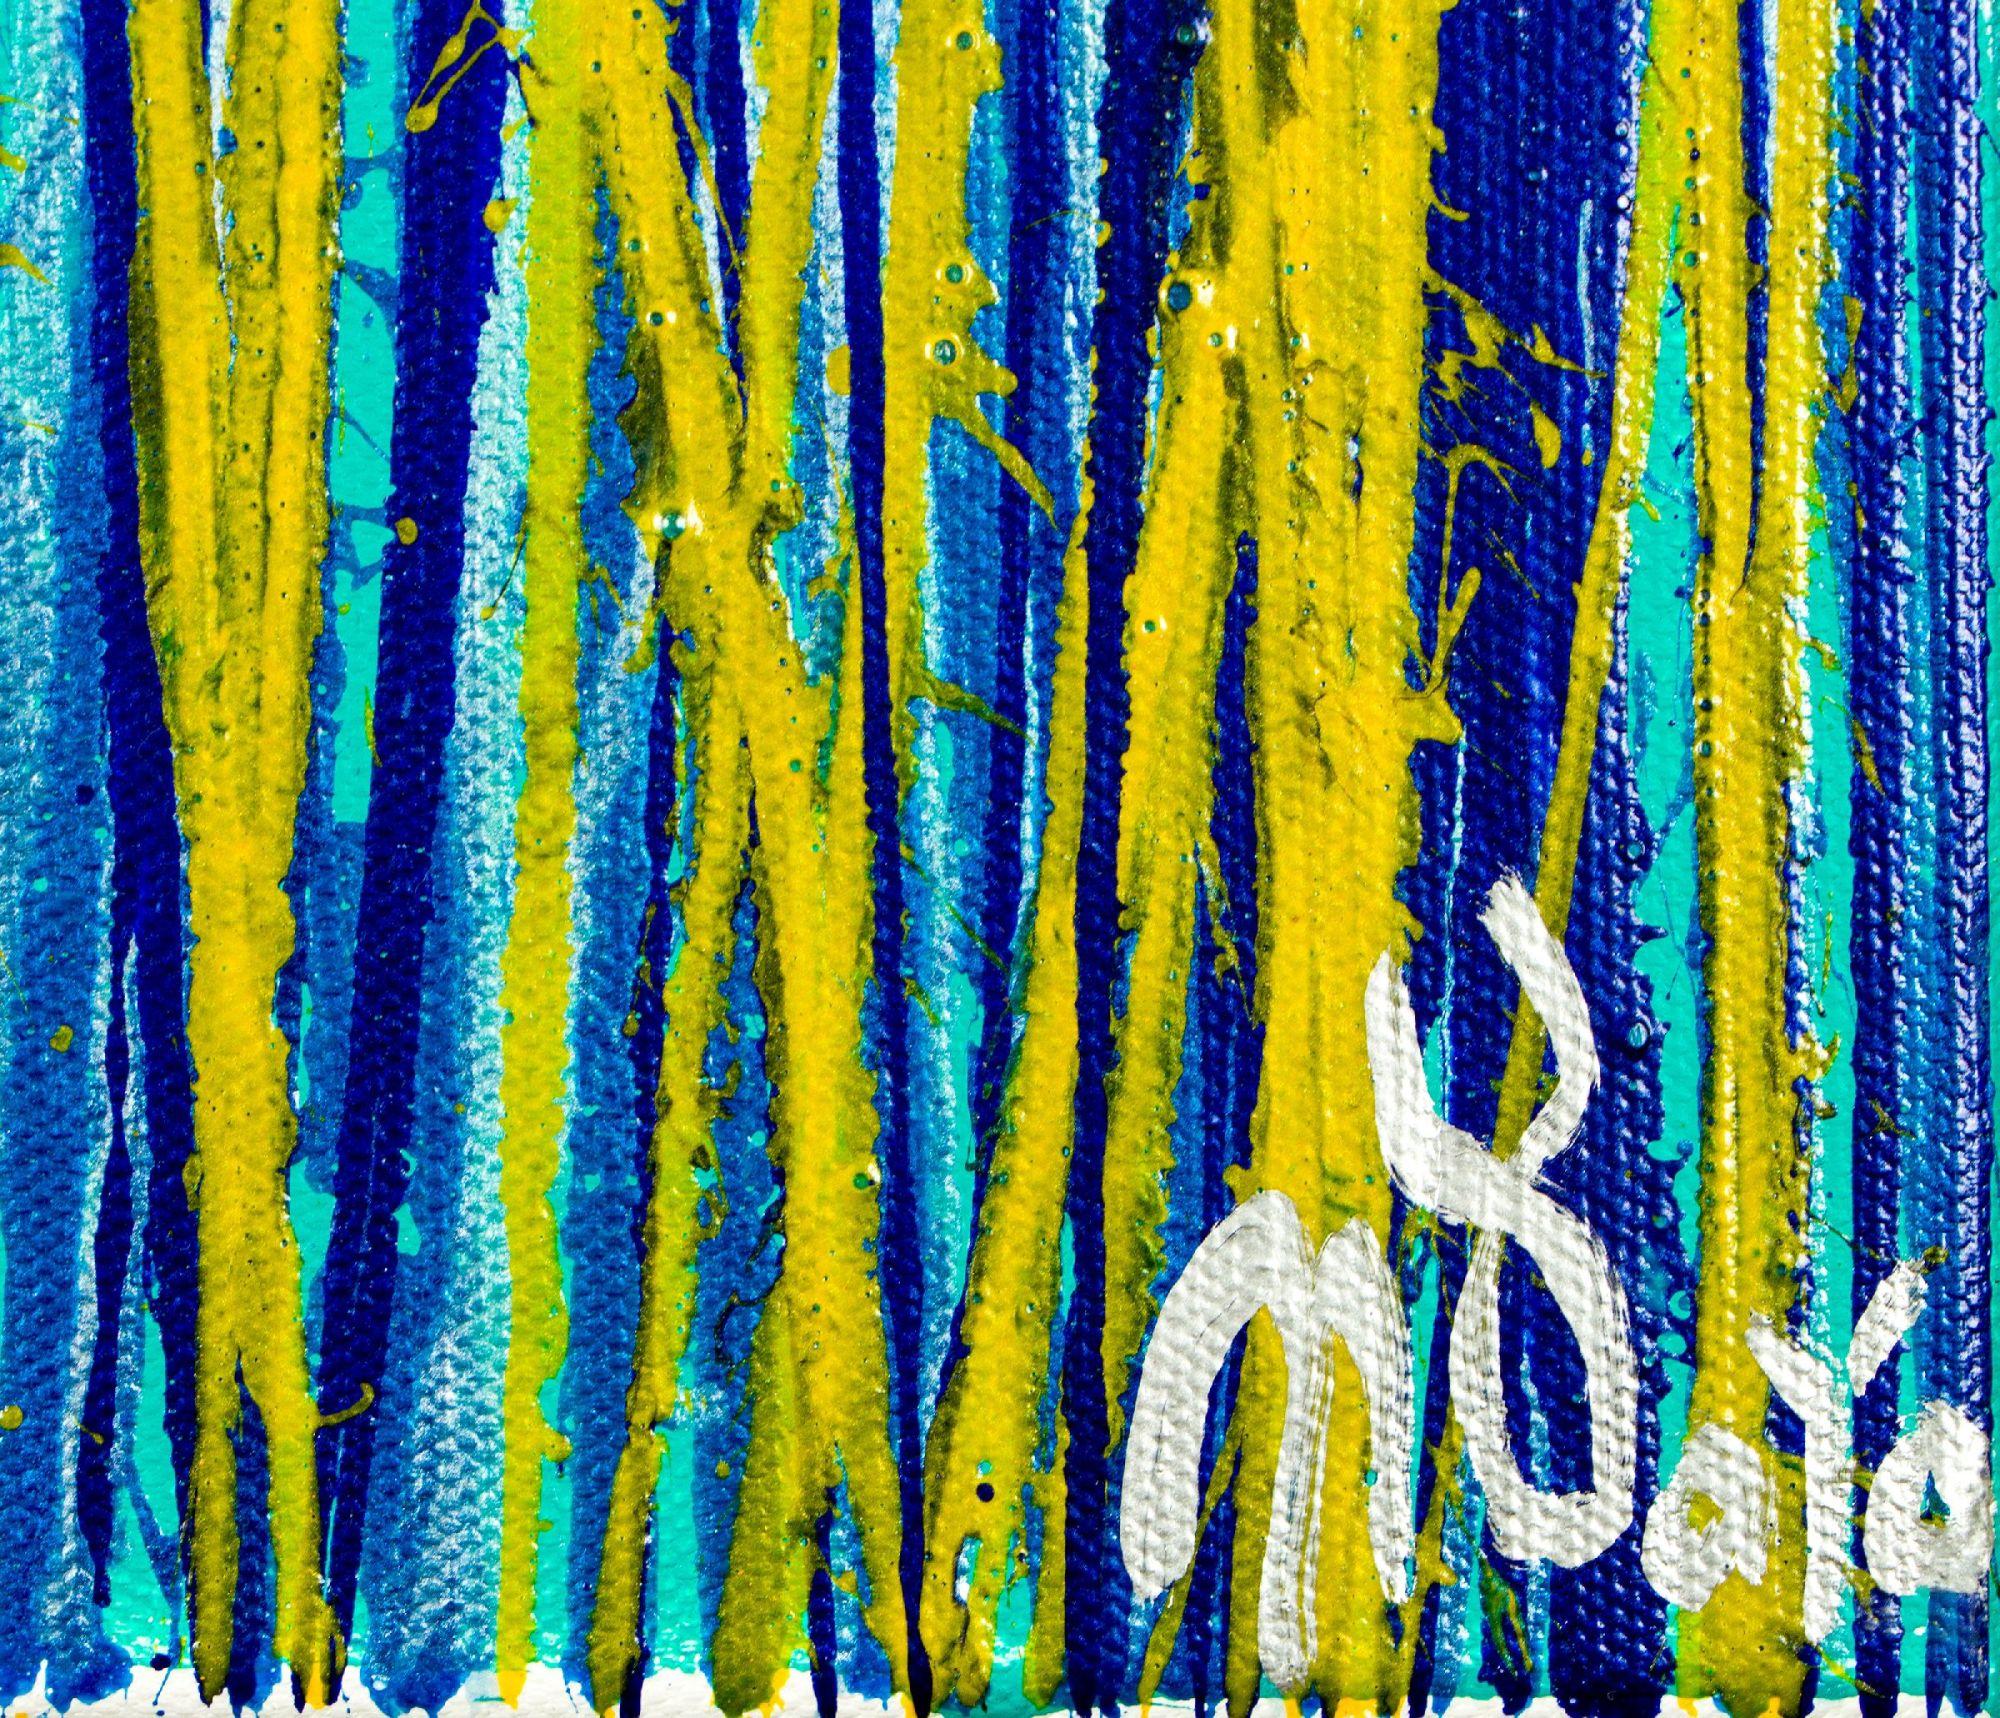 Signature / Vernal Garden (With Green) (2020) / Triptych